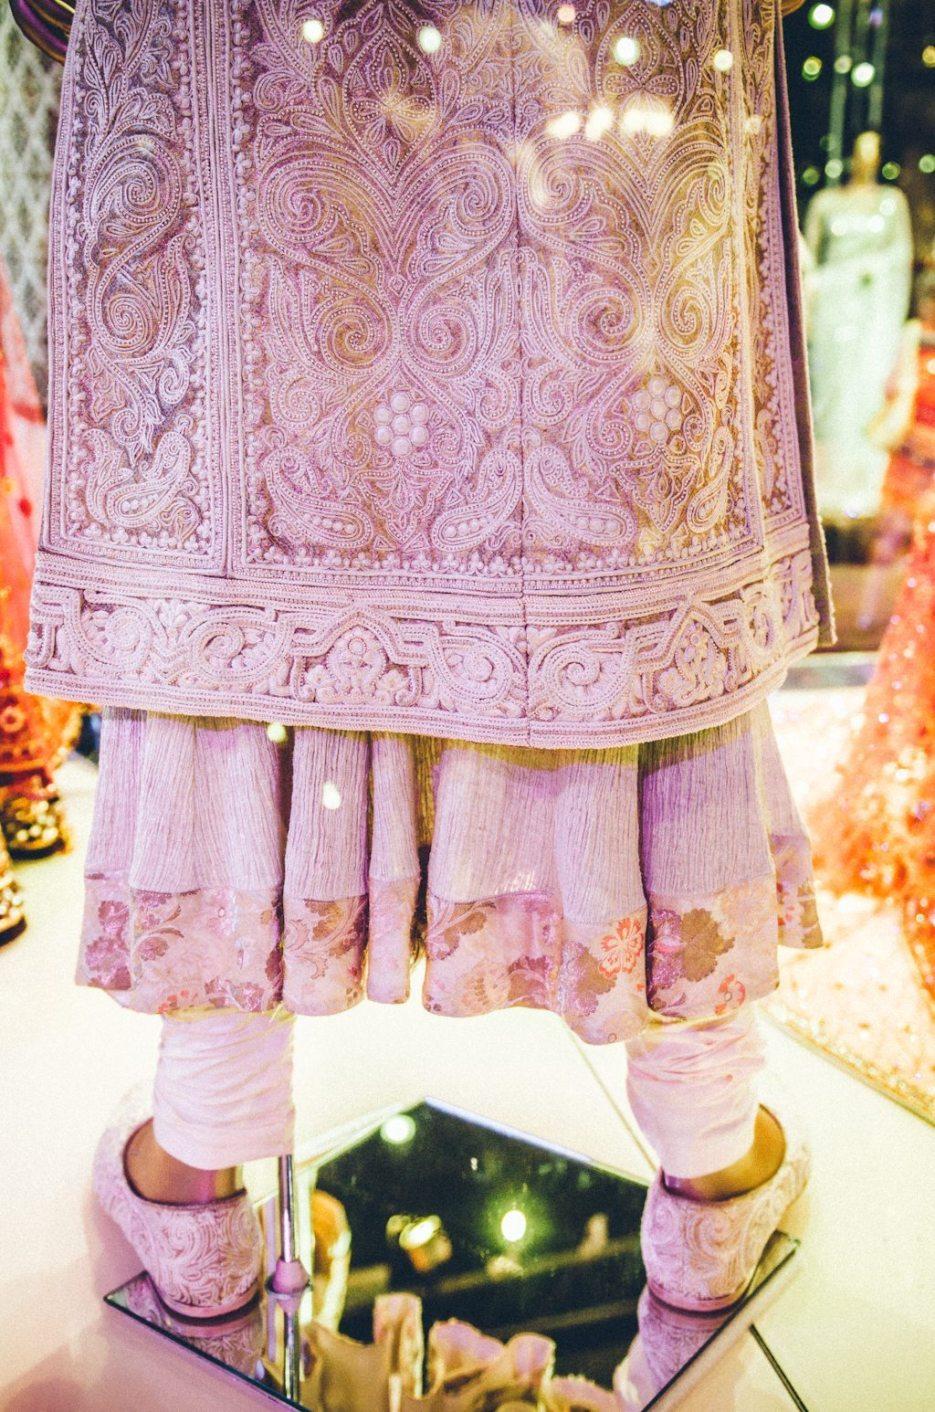 Tarun-Tahiliani-Bridal-Couture-Wedding-Wear-Fashion-Designer-Photographer-Naina-Knottytales-50.jpg